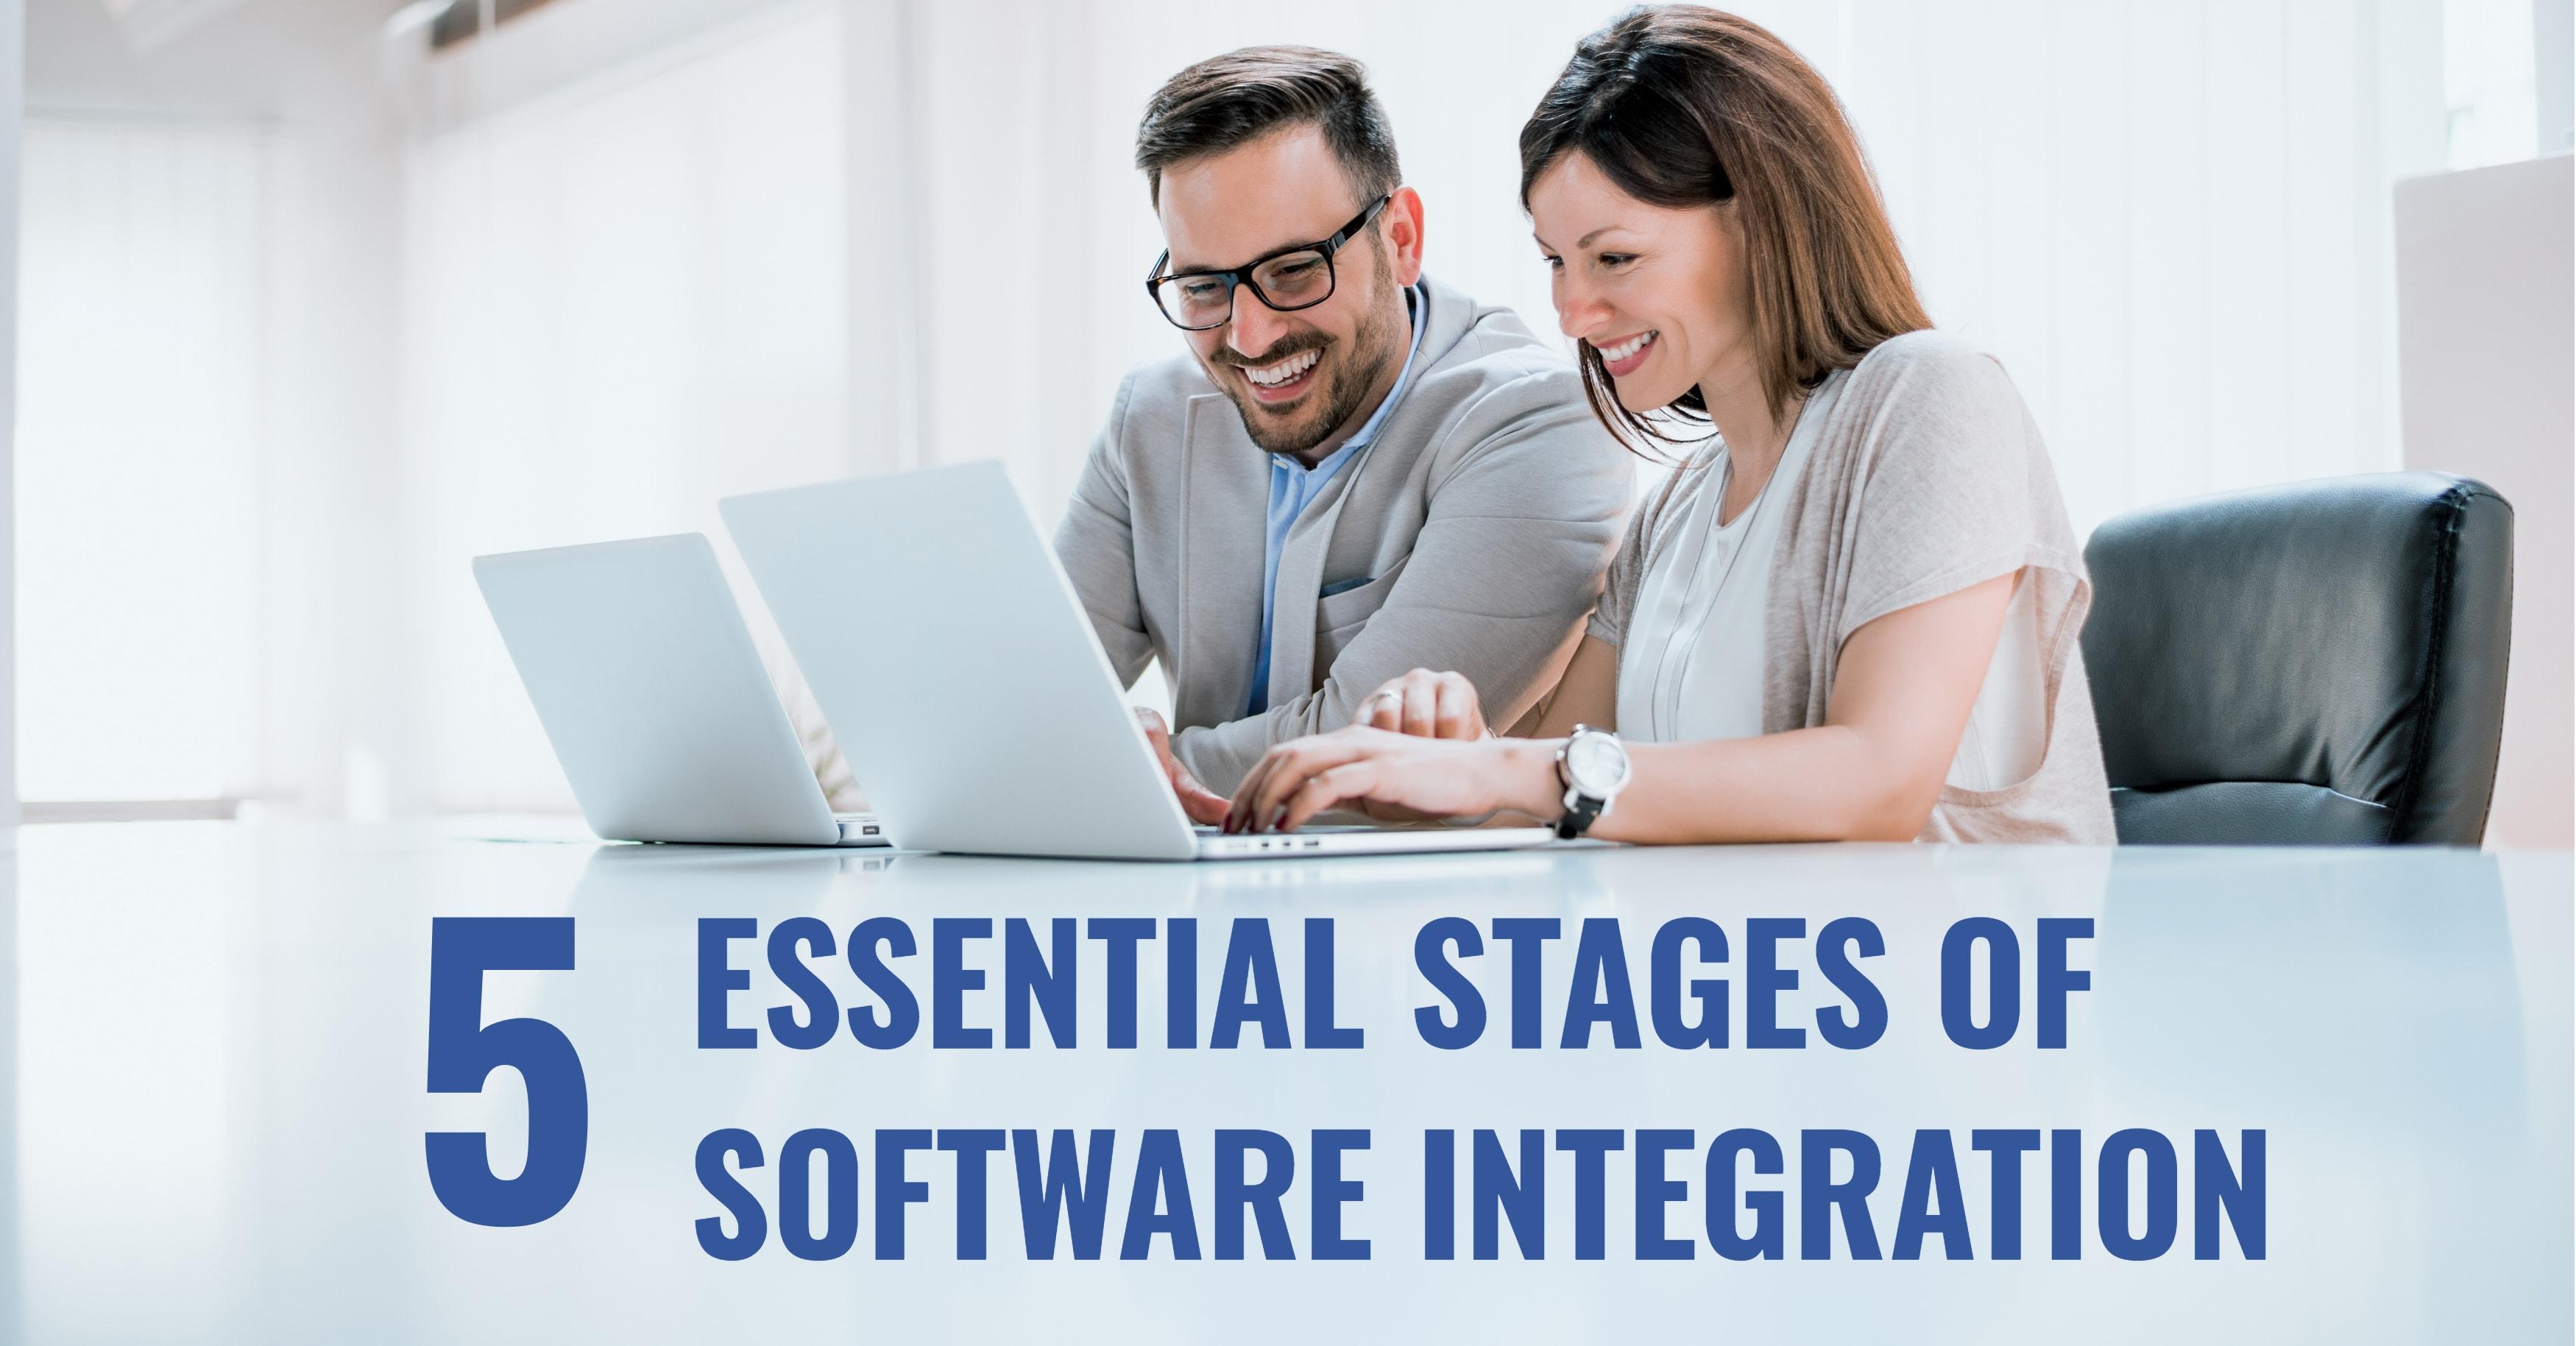 Software Integration Stages